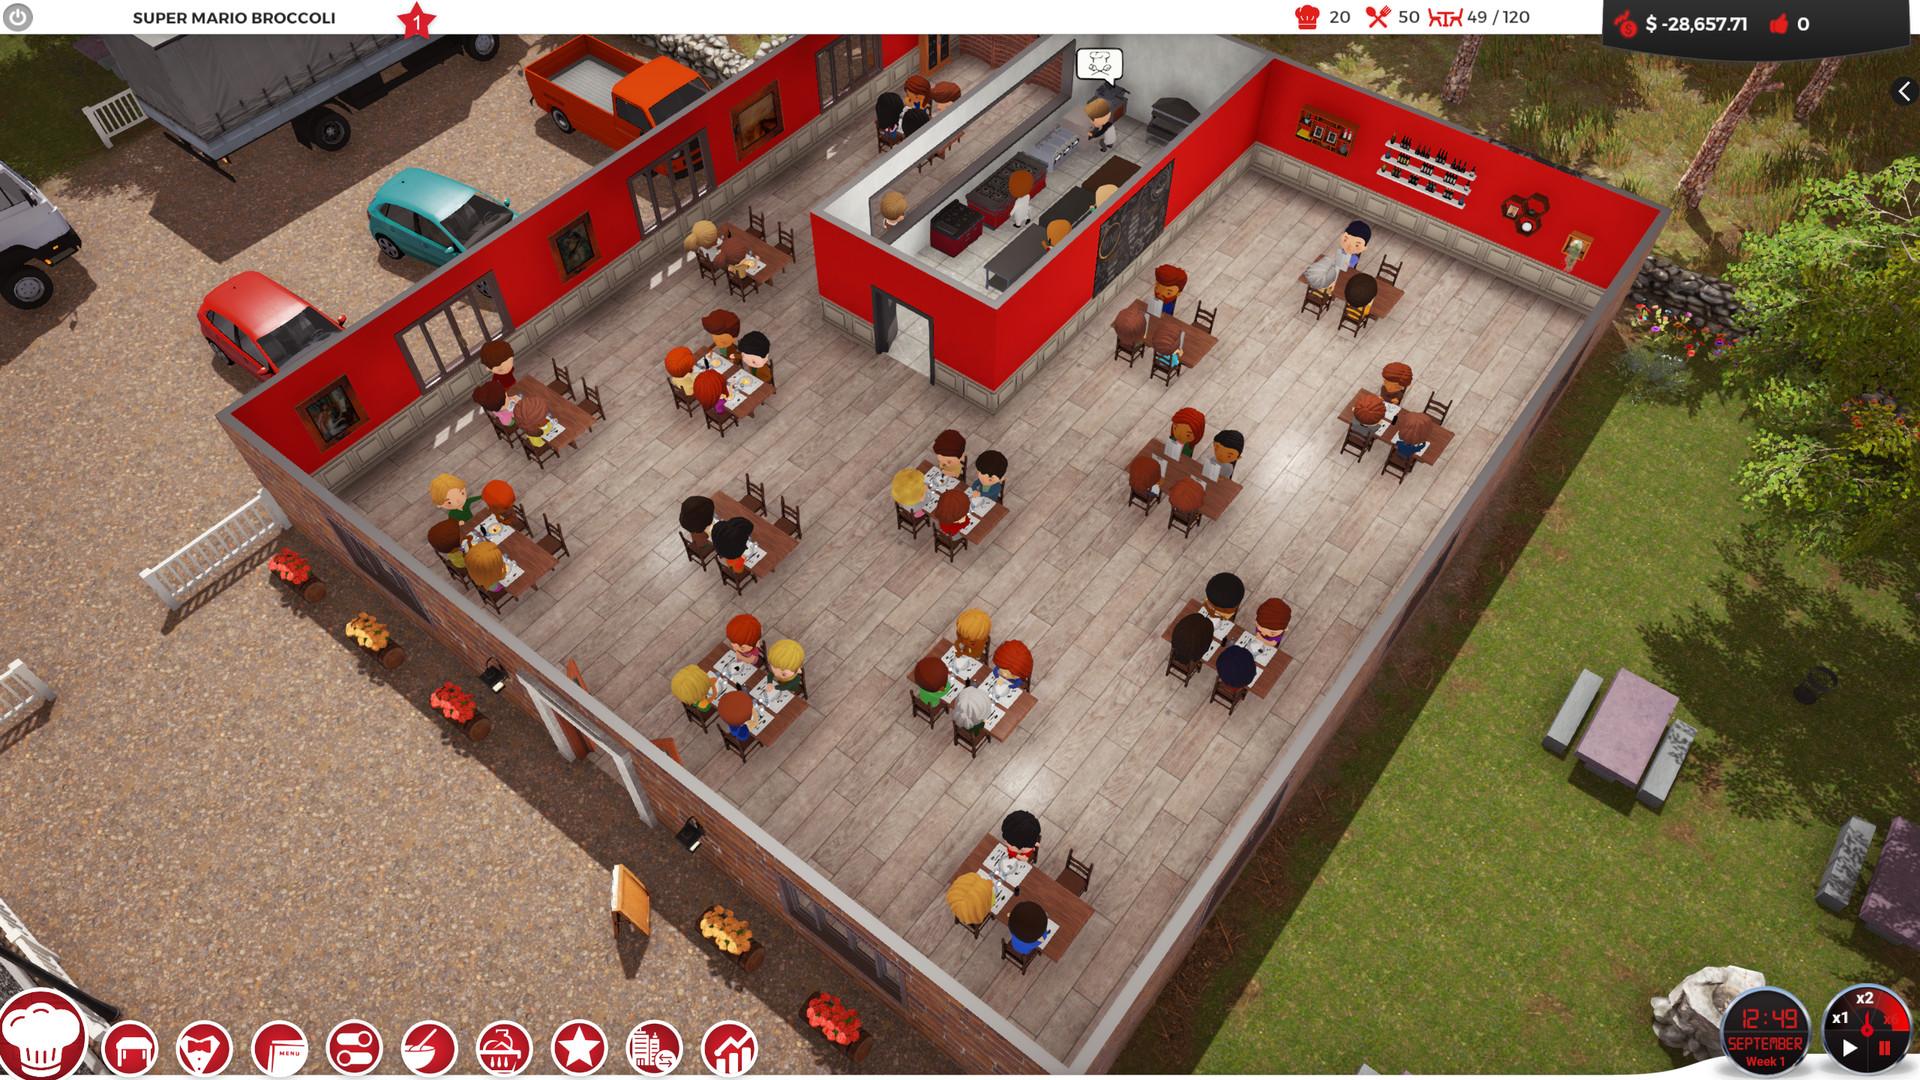 gratis dating sites in Patna